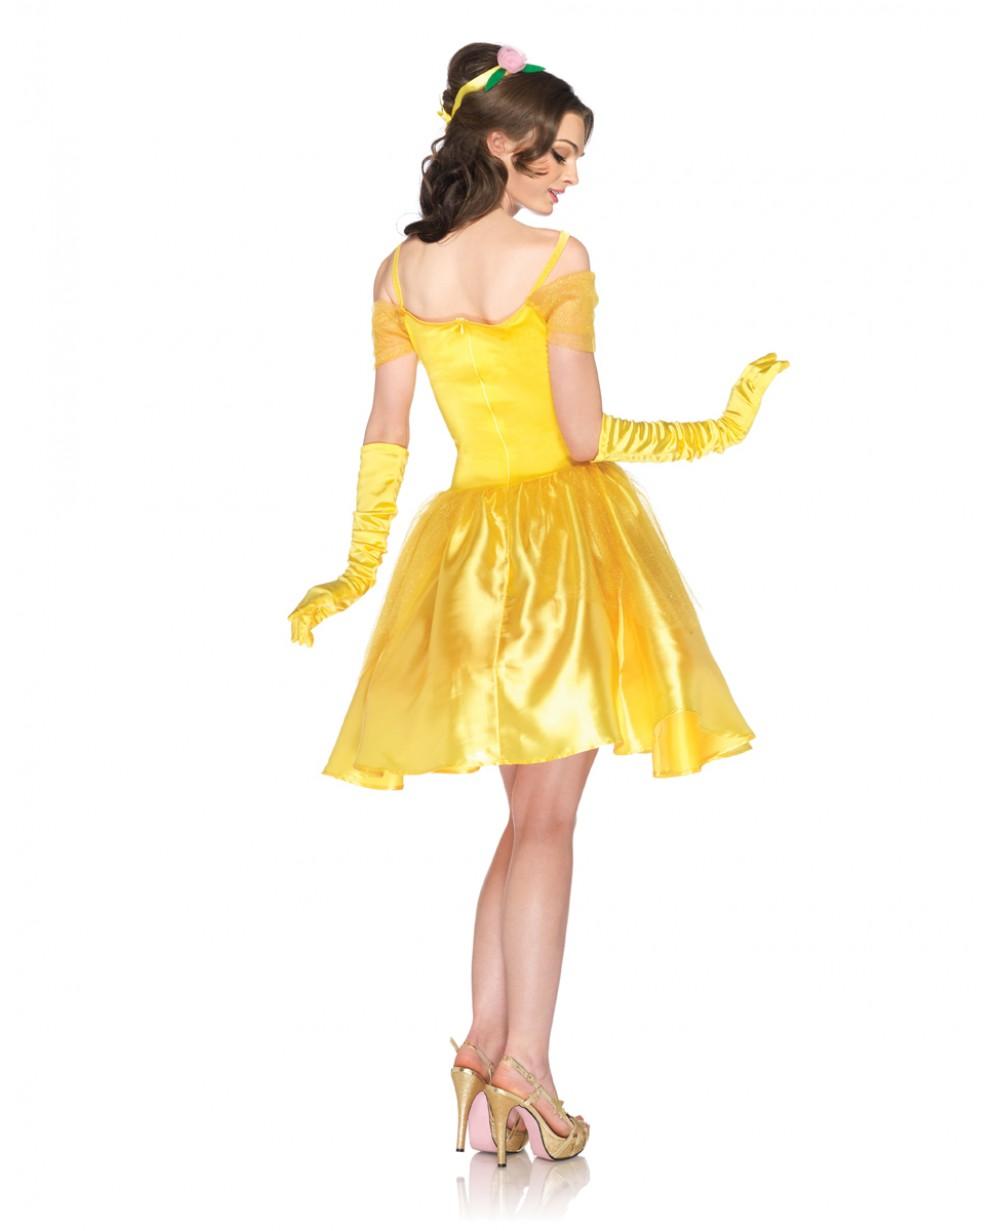 SaveEnlarge · Belle Disney Womens Disney Deluxe Belle Costume  sc 1 st  Meningrey & Disney Belle Costume Womens - Meningrey